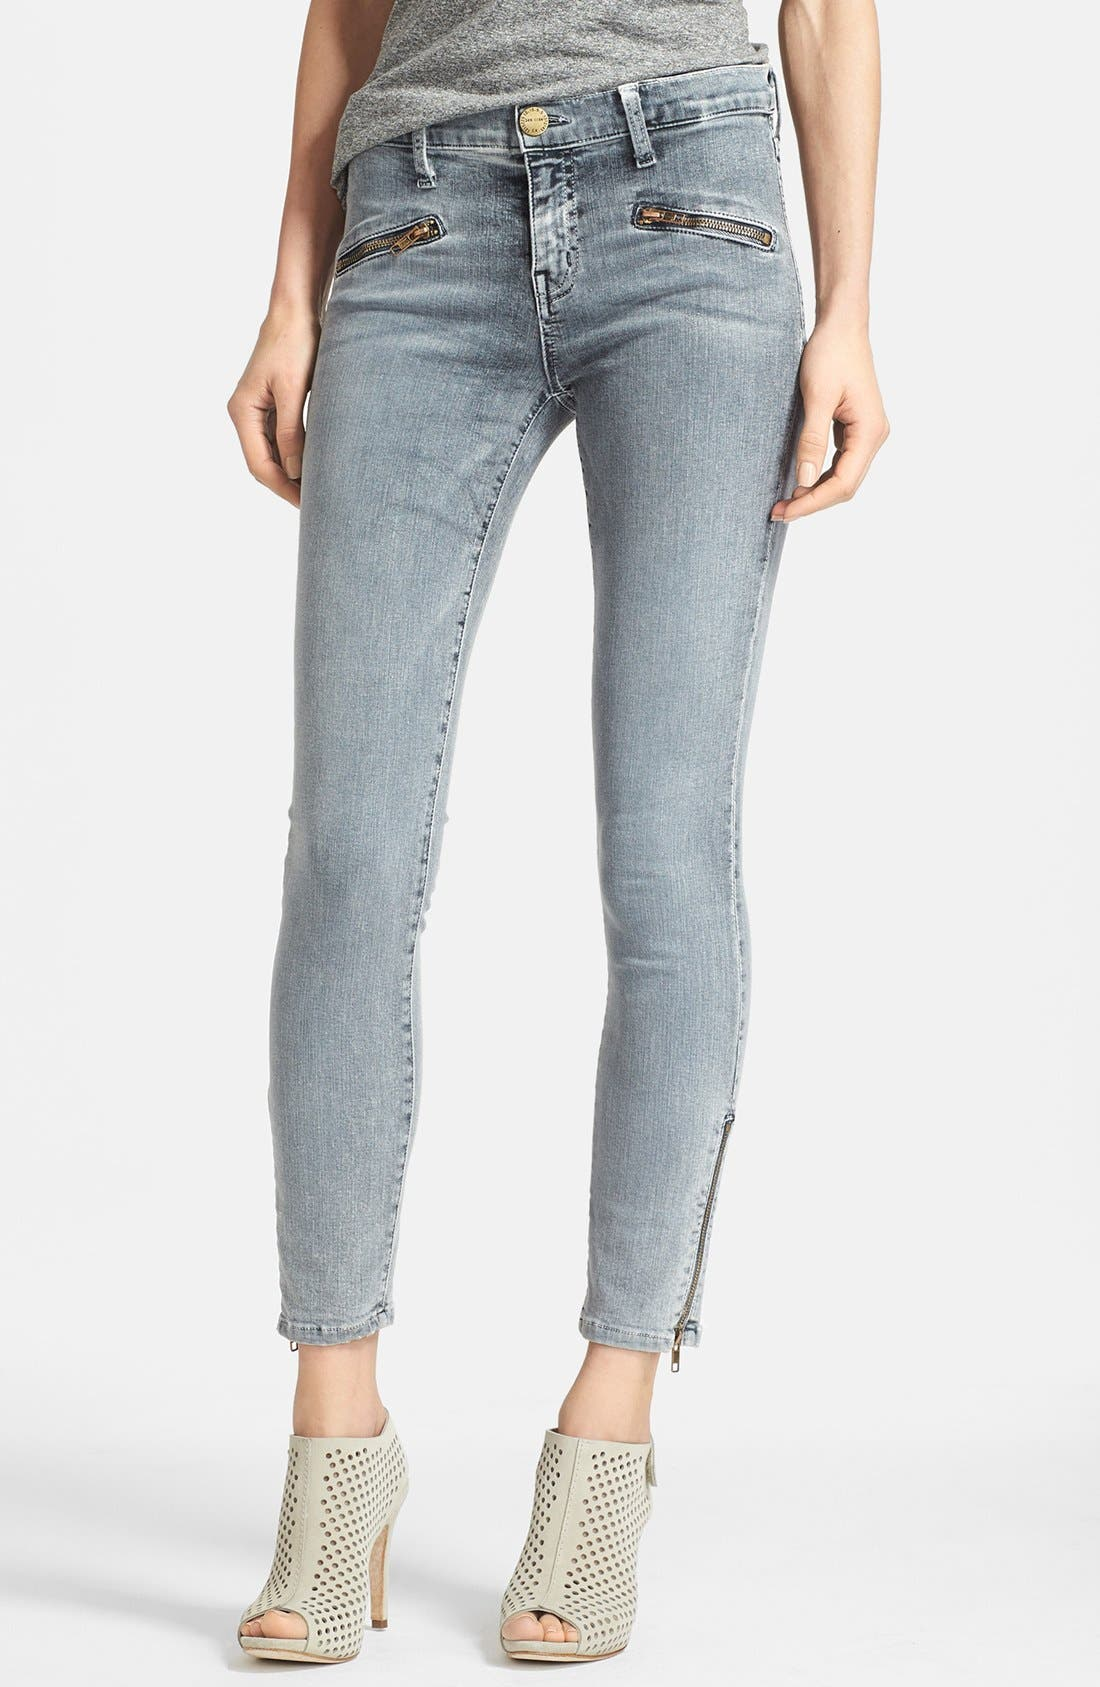 Alternate Image 1 Selected - Current/Elliott 'The Soho' Zip Stiletto Skinny Jeans (Bleach Out Navy)